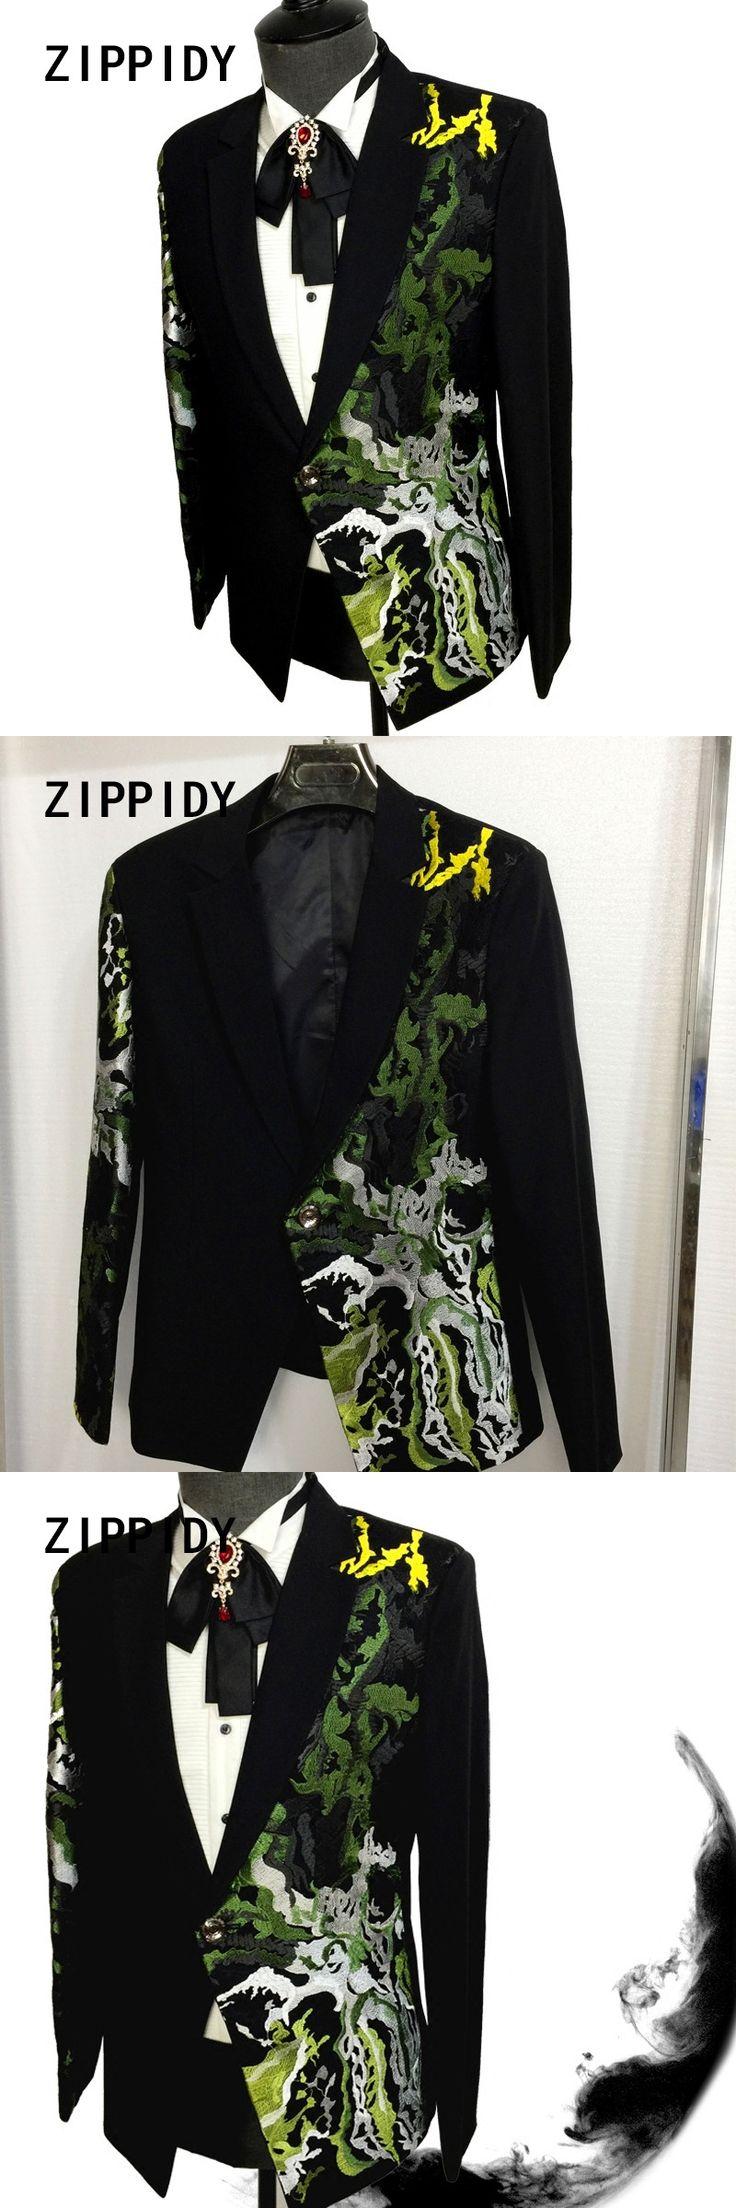 New Fashion Printed Design Trendy Slim Men's Suit Jacket Nightclub Celebrate Male Singer Prom Blazer Costumes Stage Show Clothes